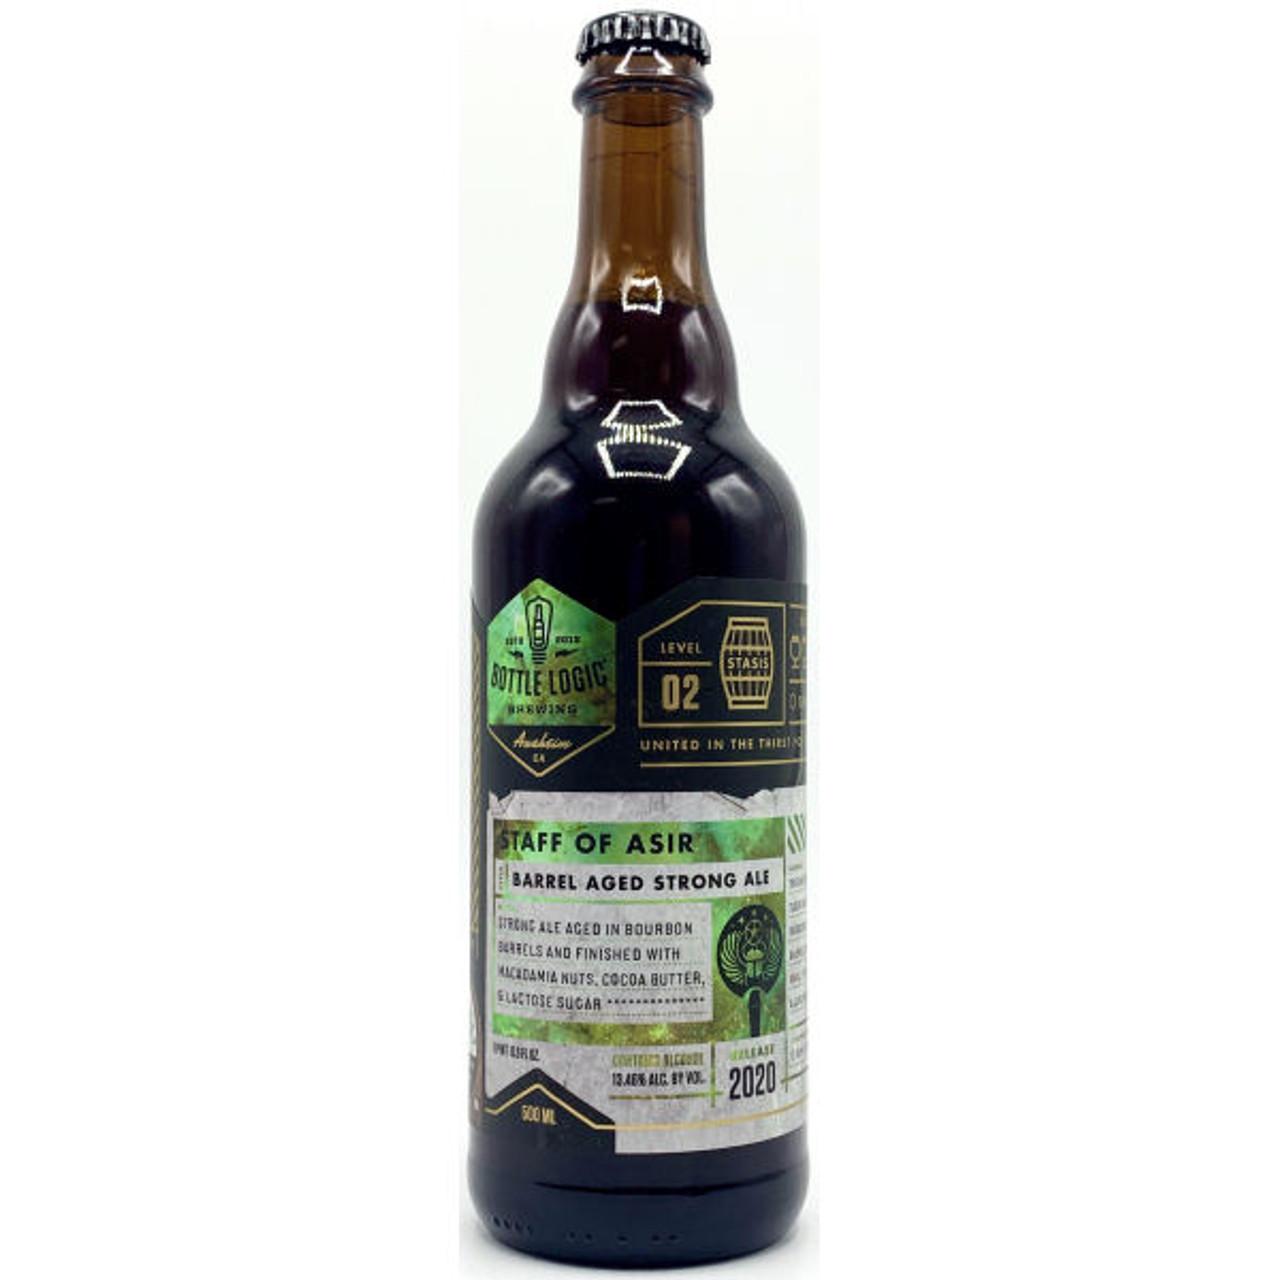 Bottle Logic Staff of Asir Barrel Aged Strong Ale 2020 500ml